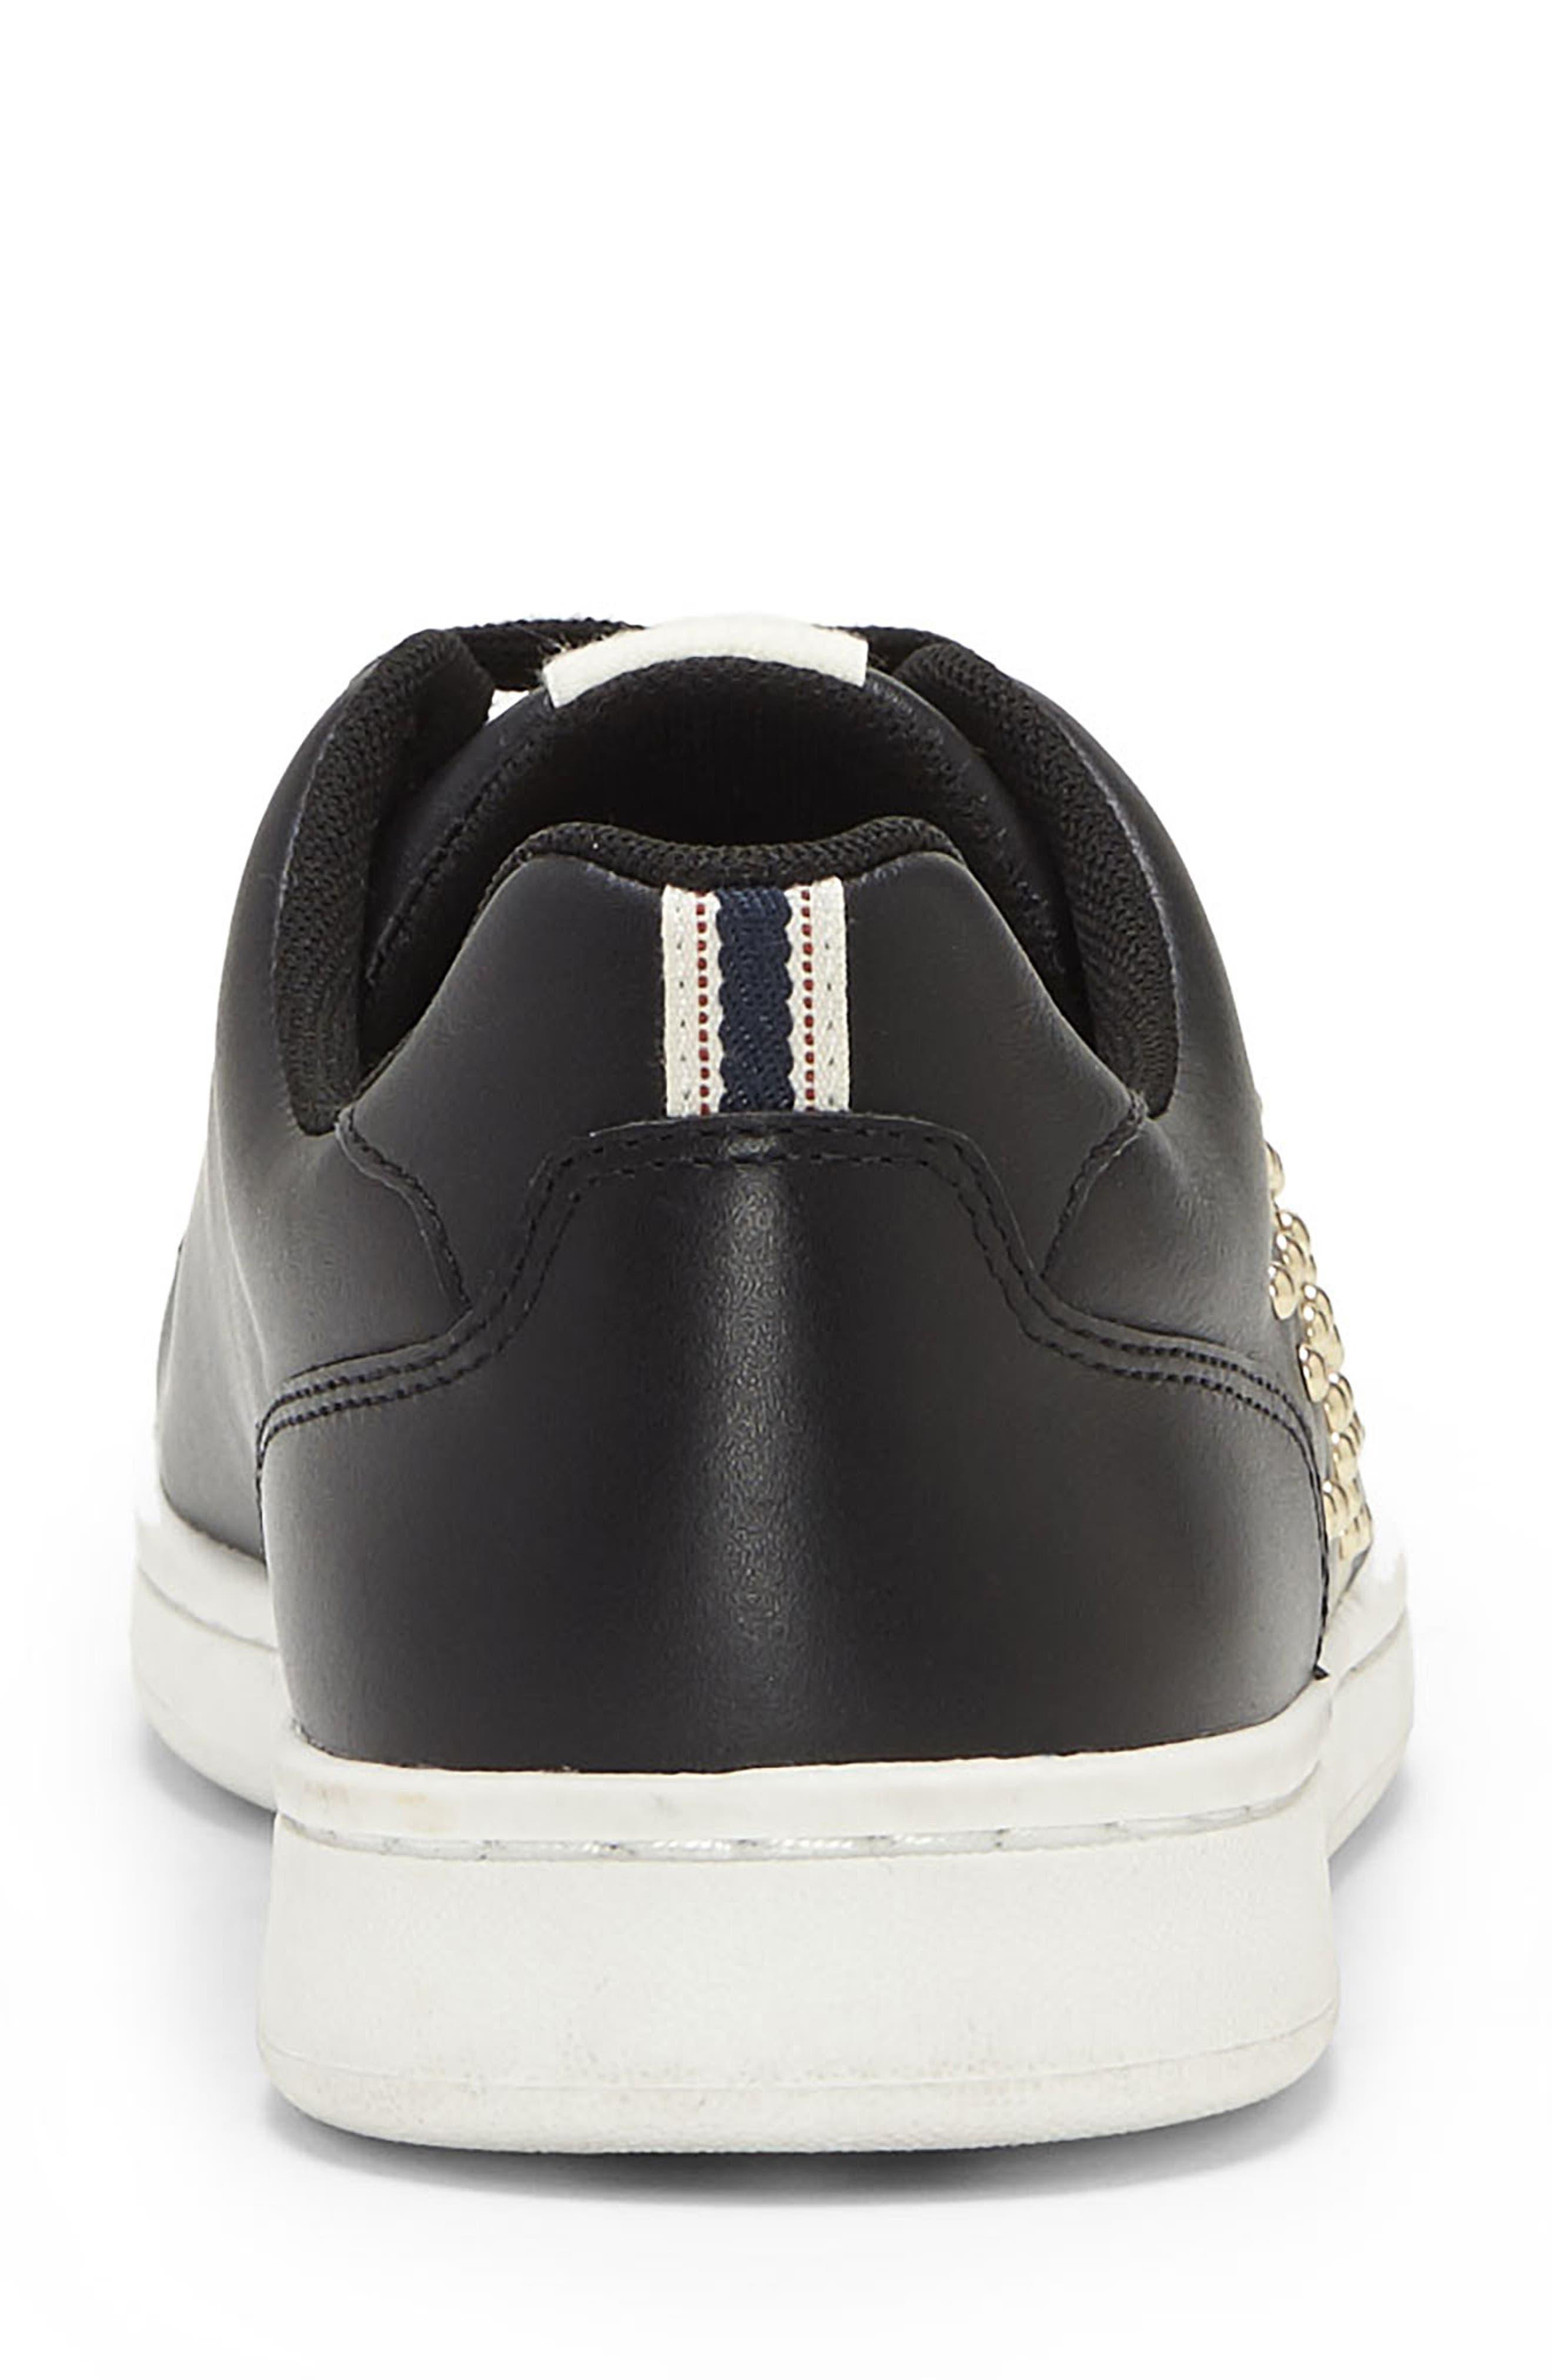 Chamour Sneaker,                             Alternate thumbnail 8, color,                             BLACK/ GOLD LEATHER